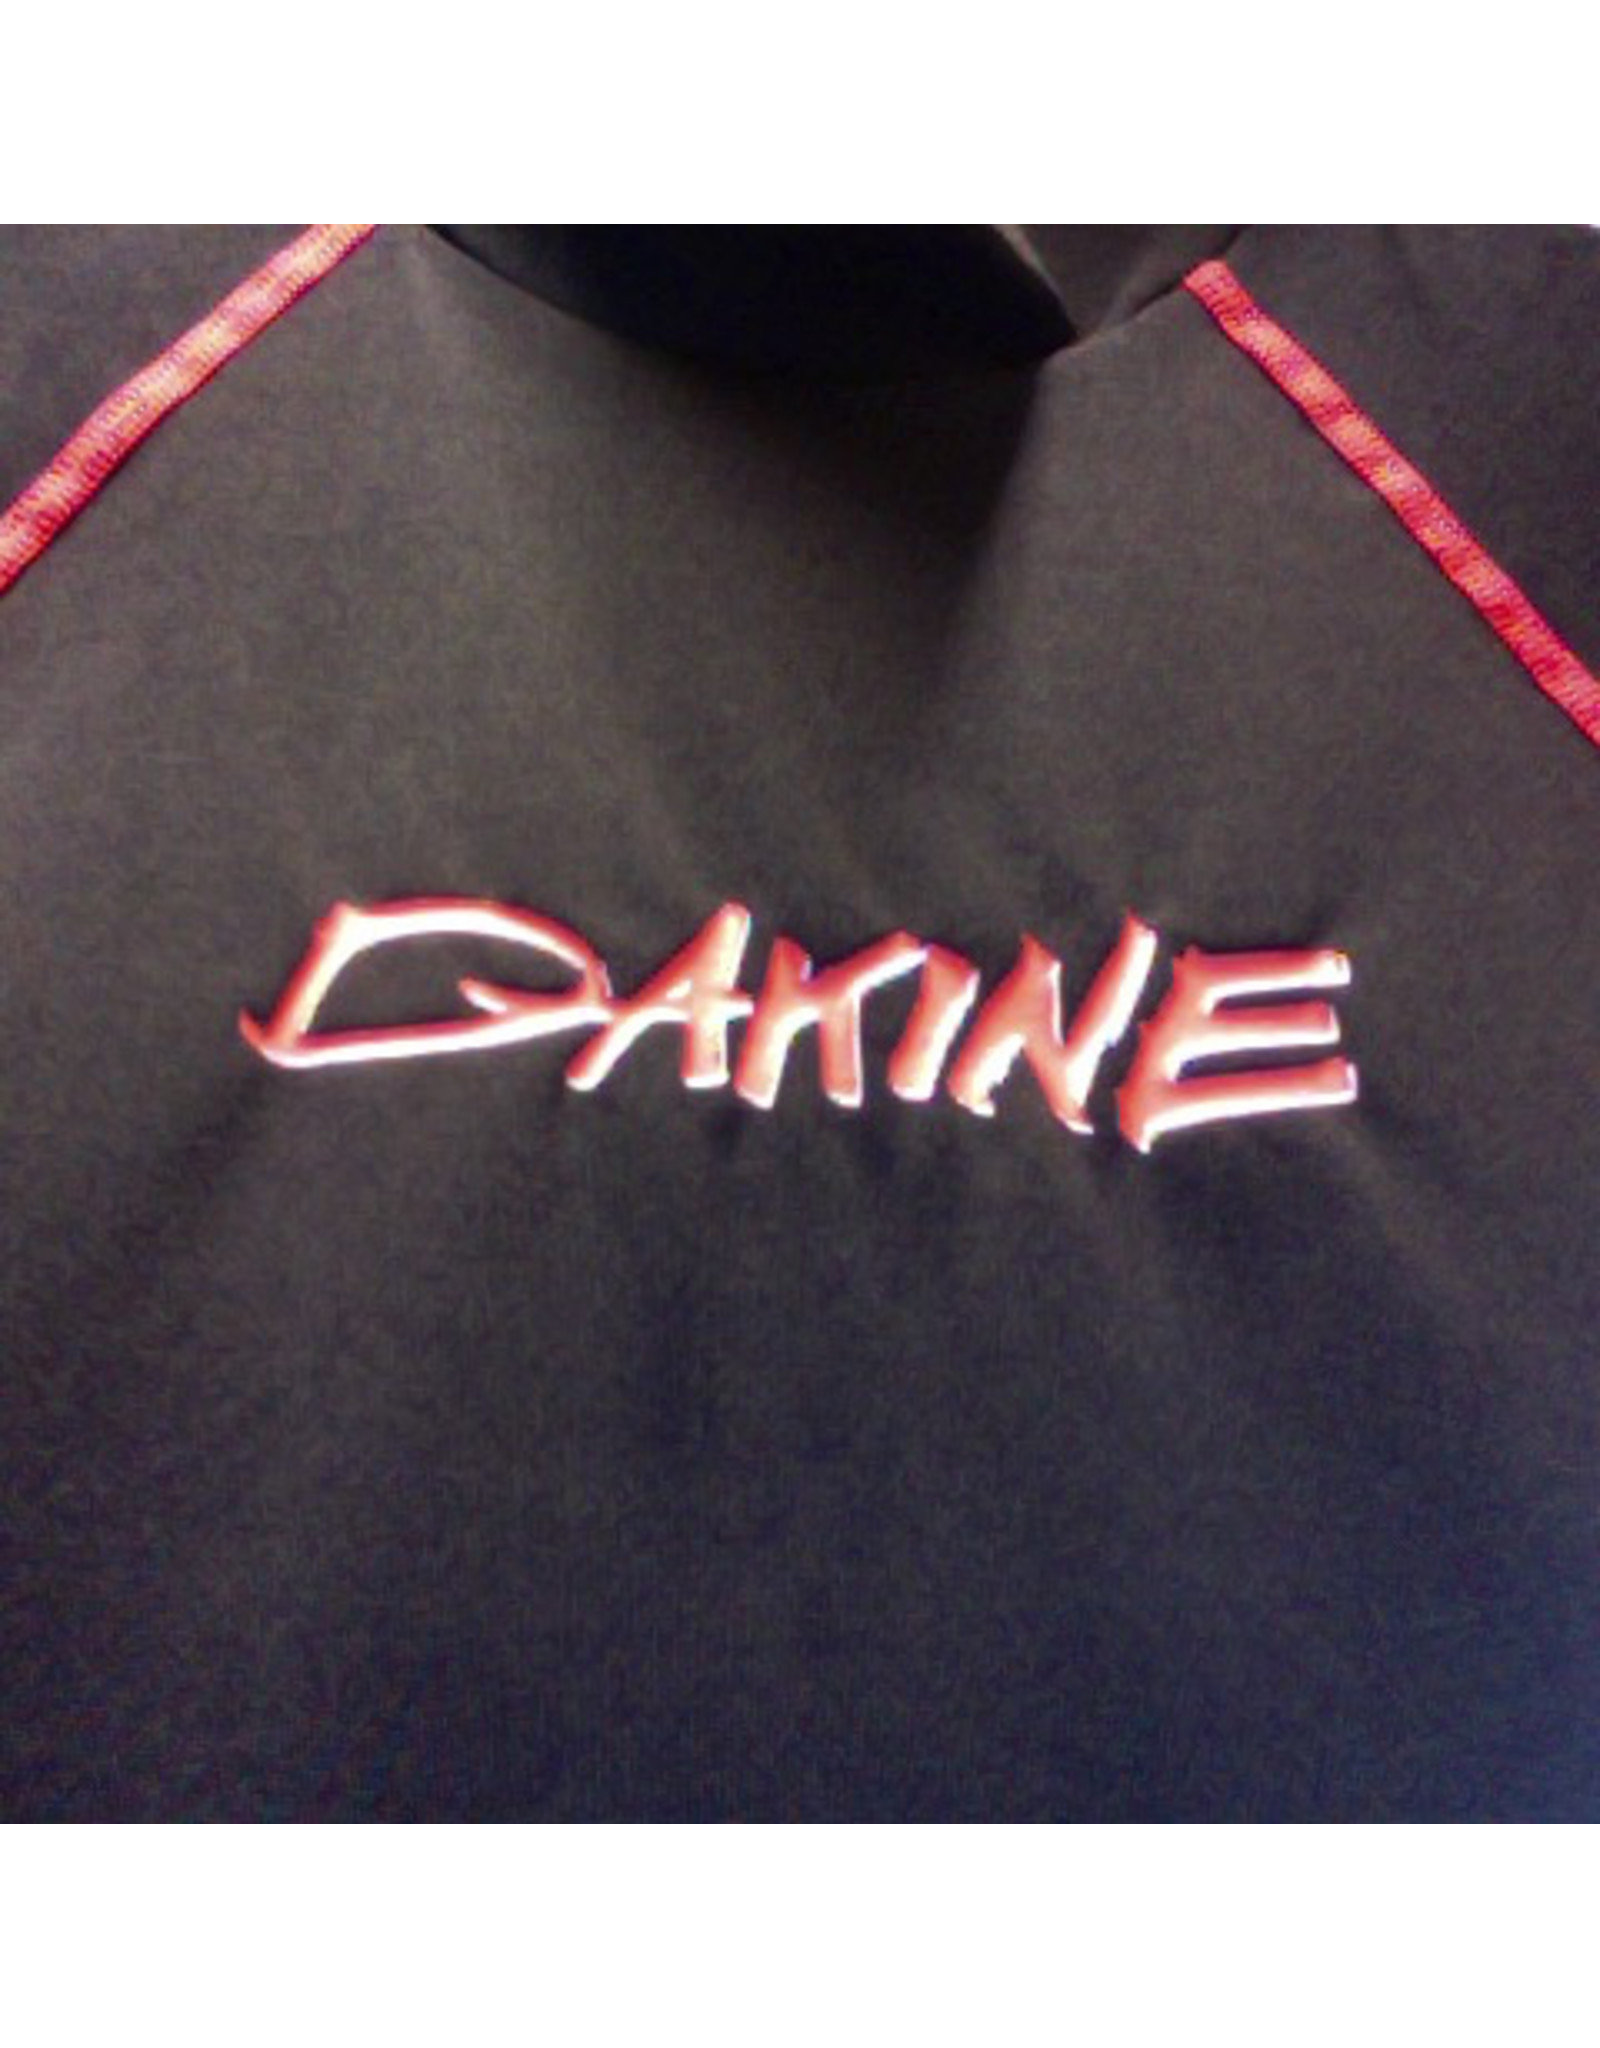 Dakine Dakine - Boys Surf Shirt, Black, 6 år